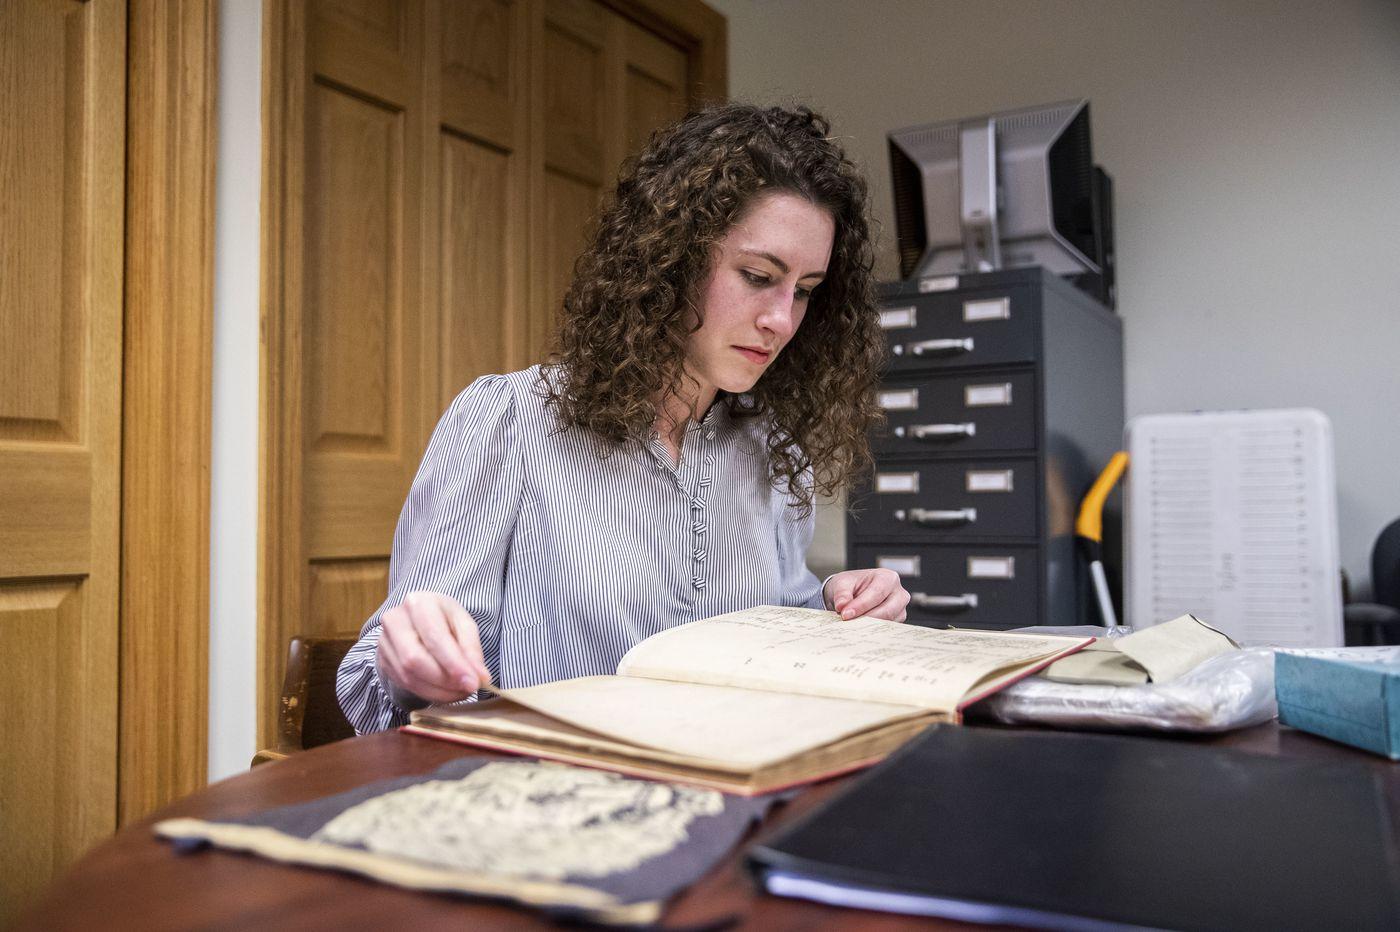 An Indentured Servant's Gift Helped Villanova University Stay Open